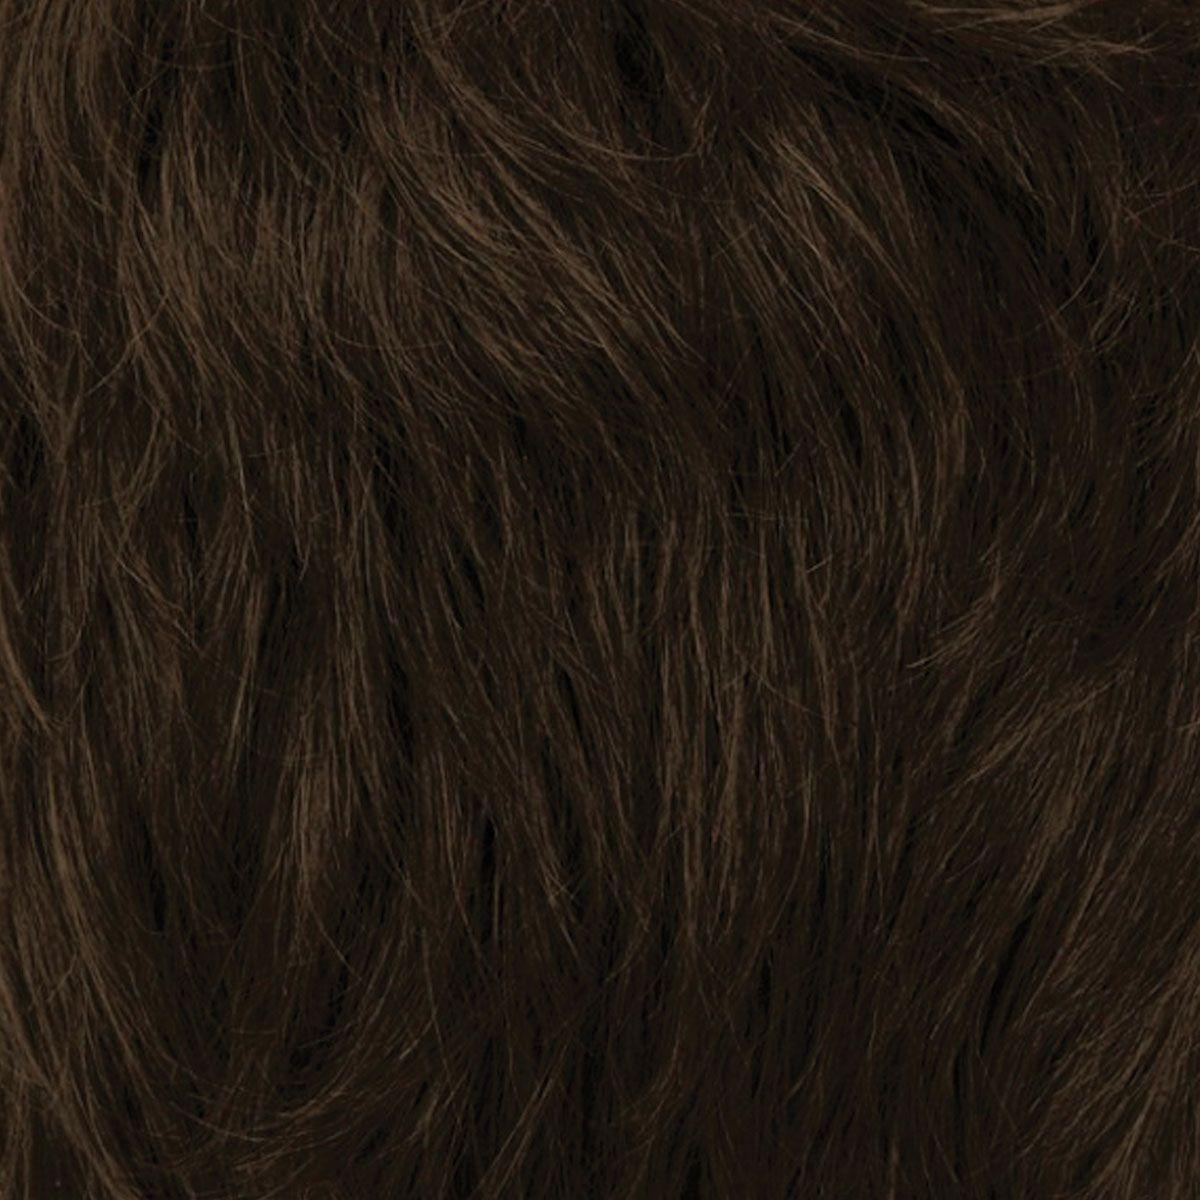 Dark Brown Hair Textures For Imvu